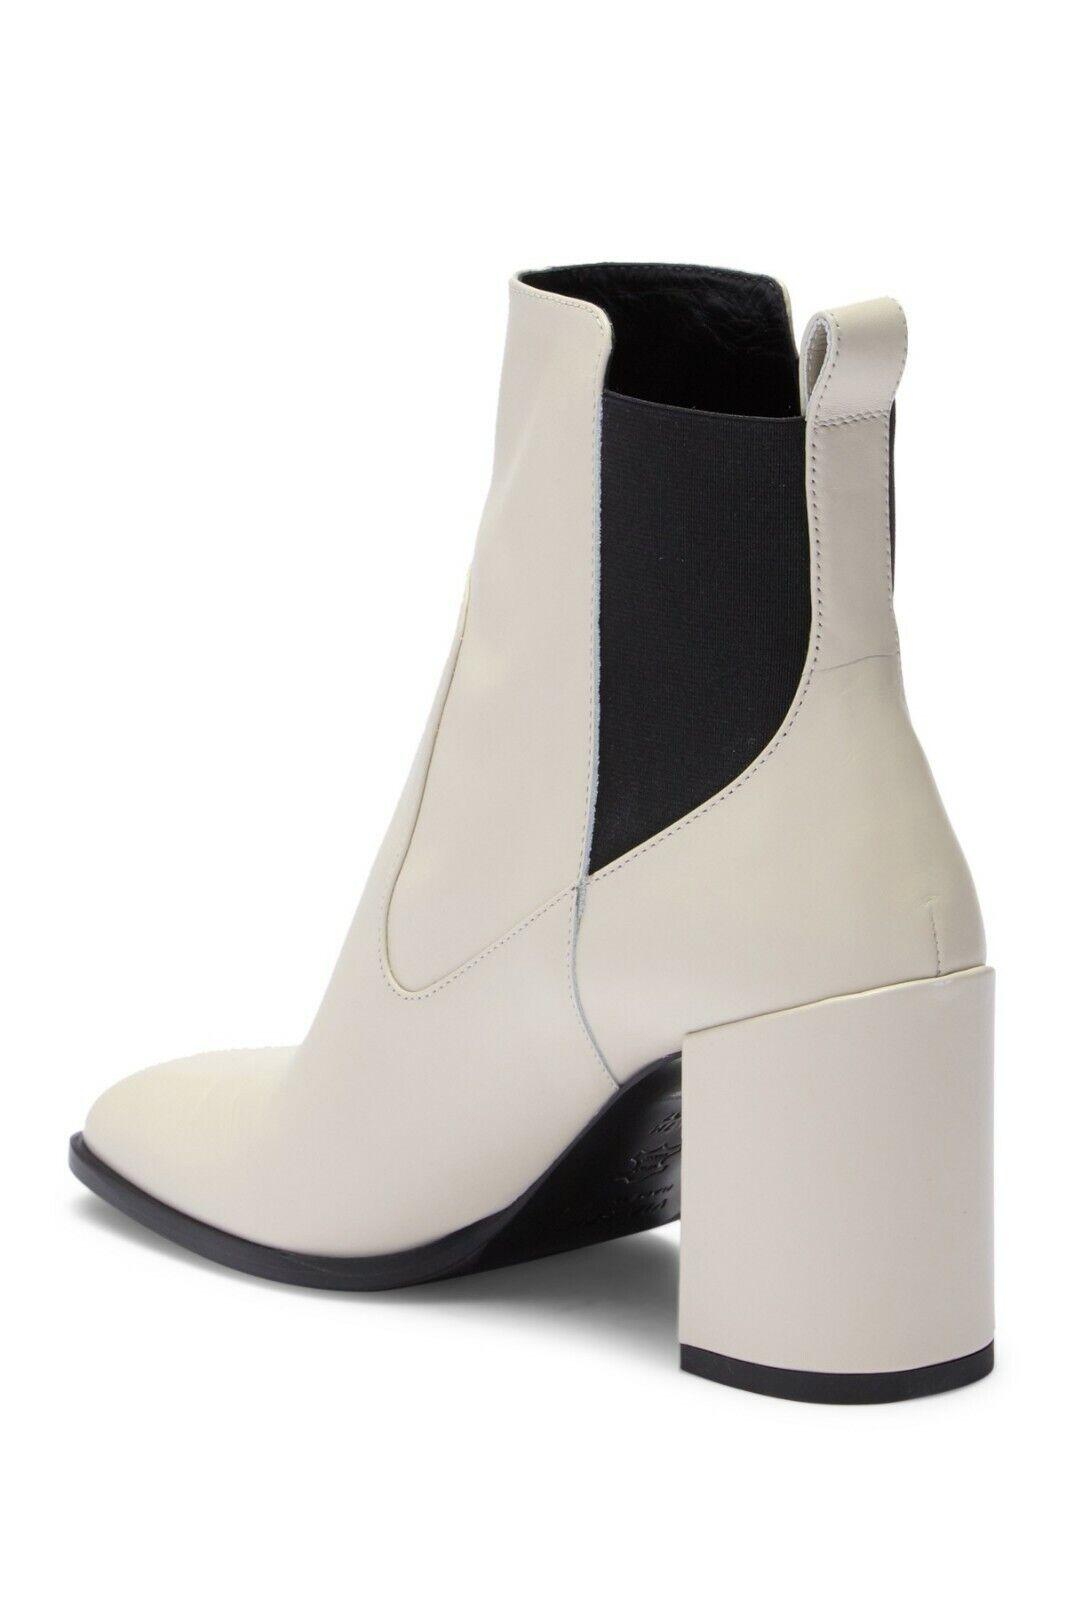 Via Spiga Delaney Leather Block Heel Heel Heel Boot, Square toe, Pull-on Size 5M  350 NWB afa102